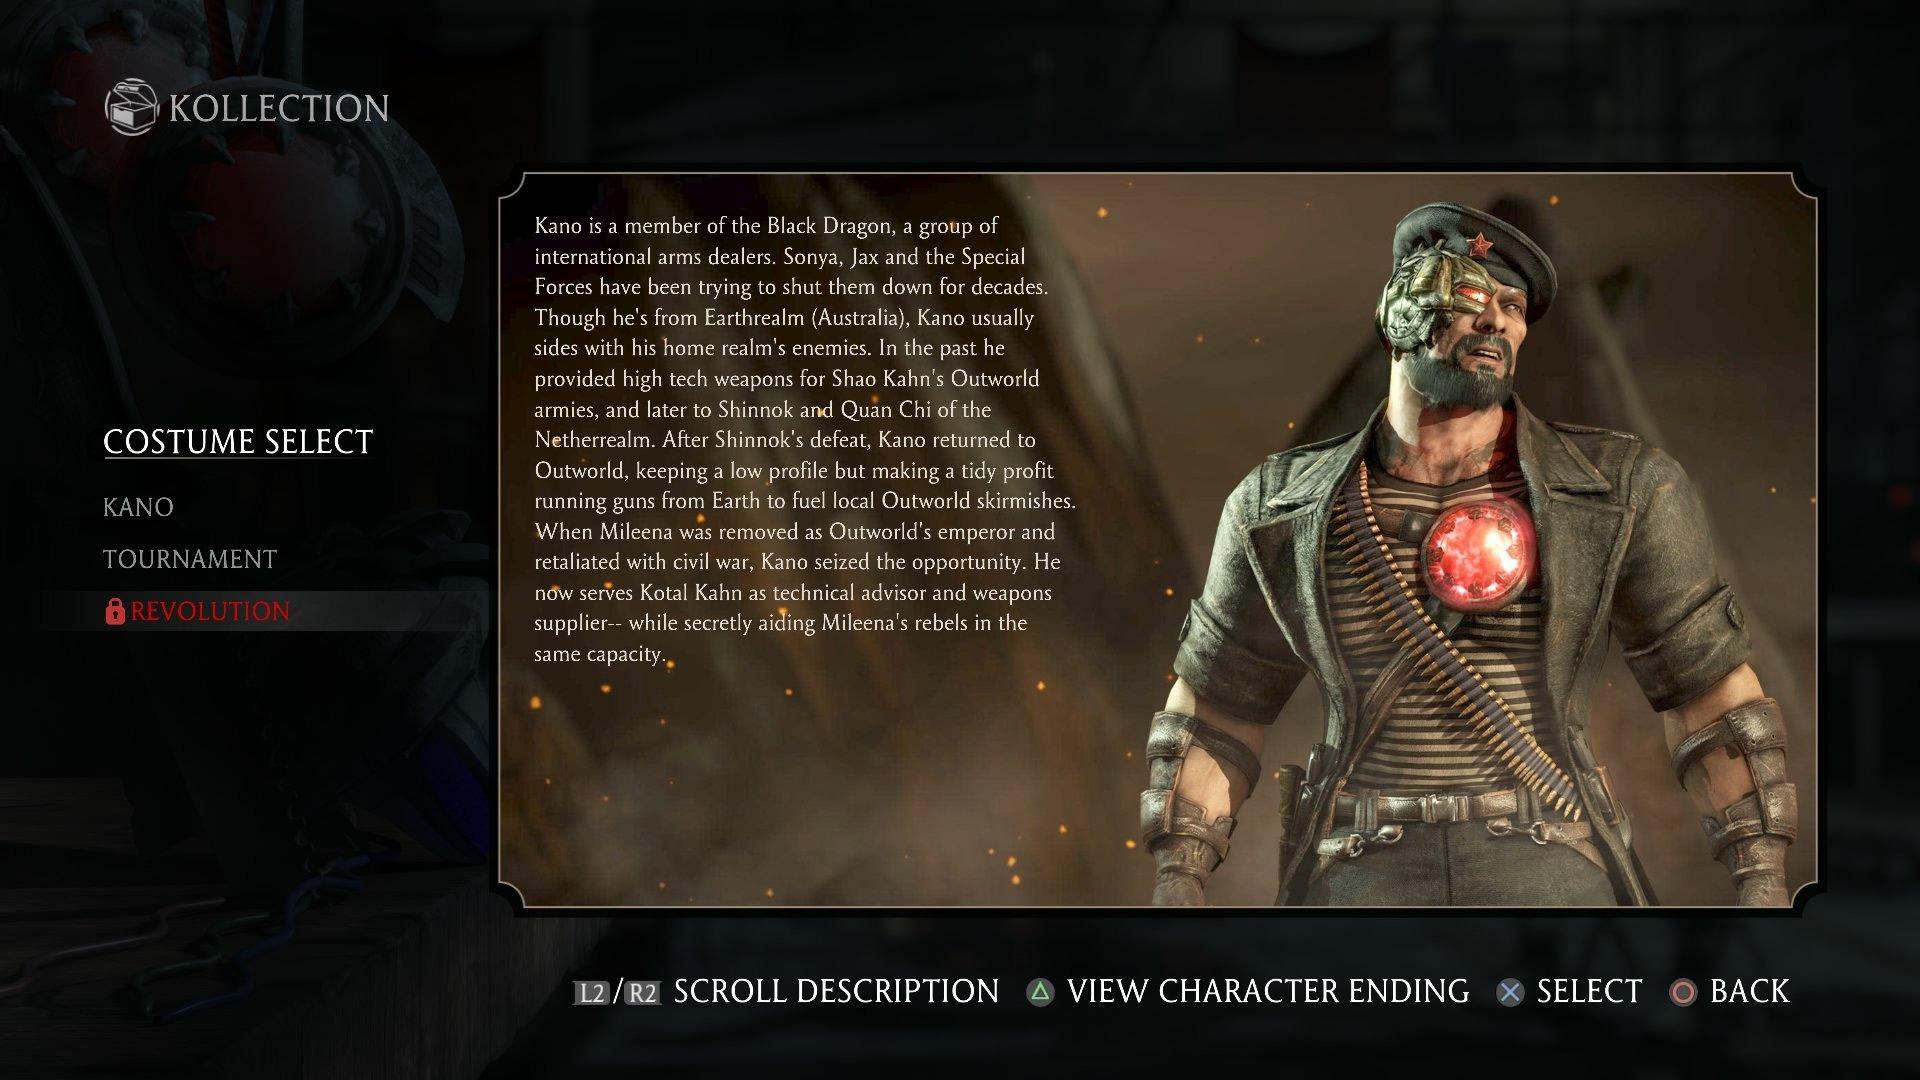 Horror Pack и Kold War DLC для Mortal Kombat X. - Изображение 6